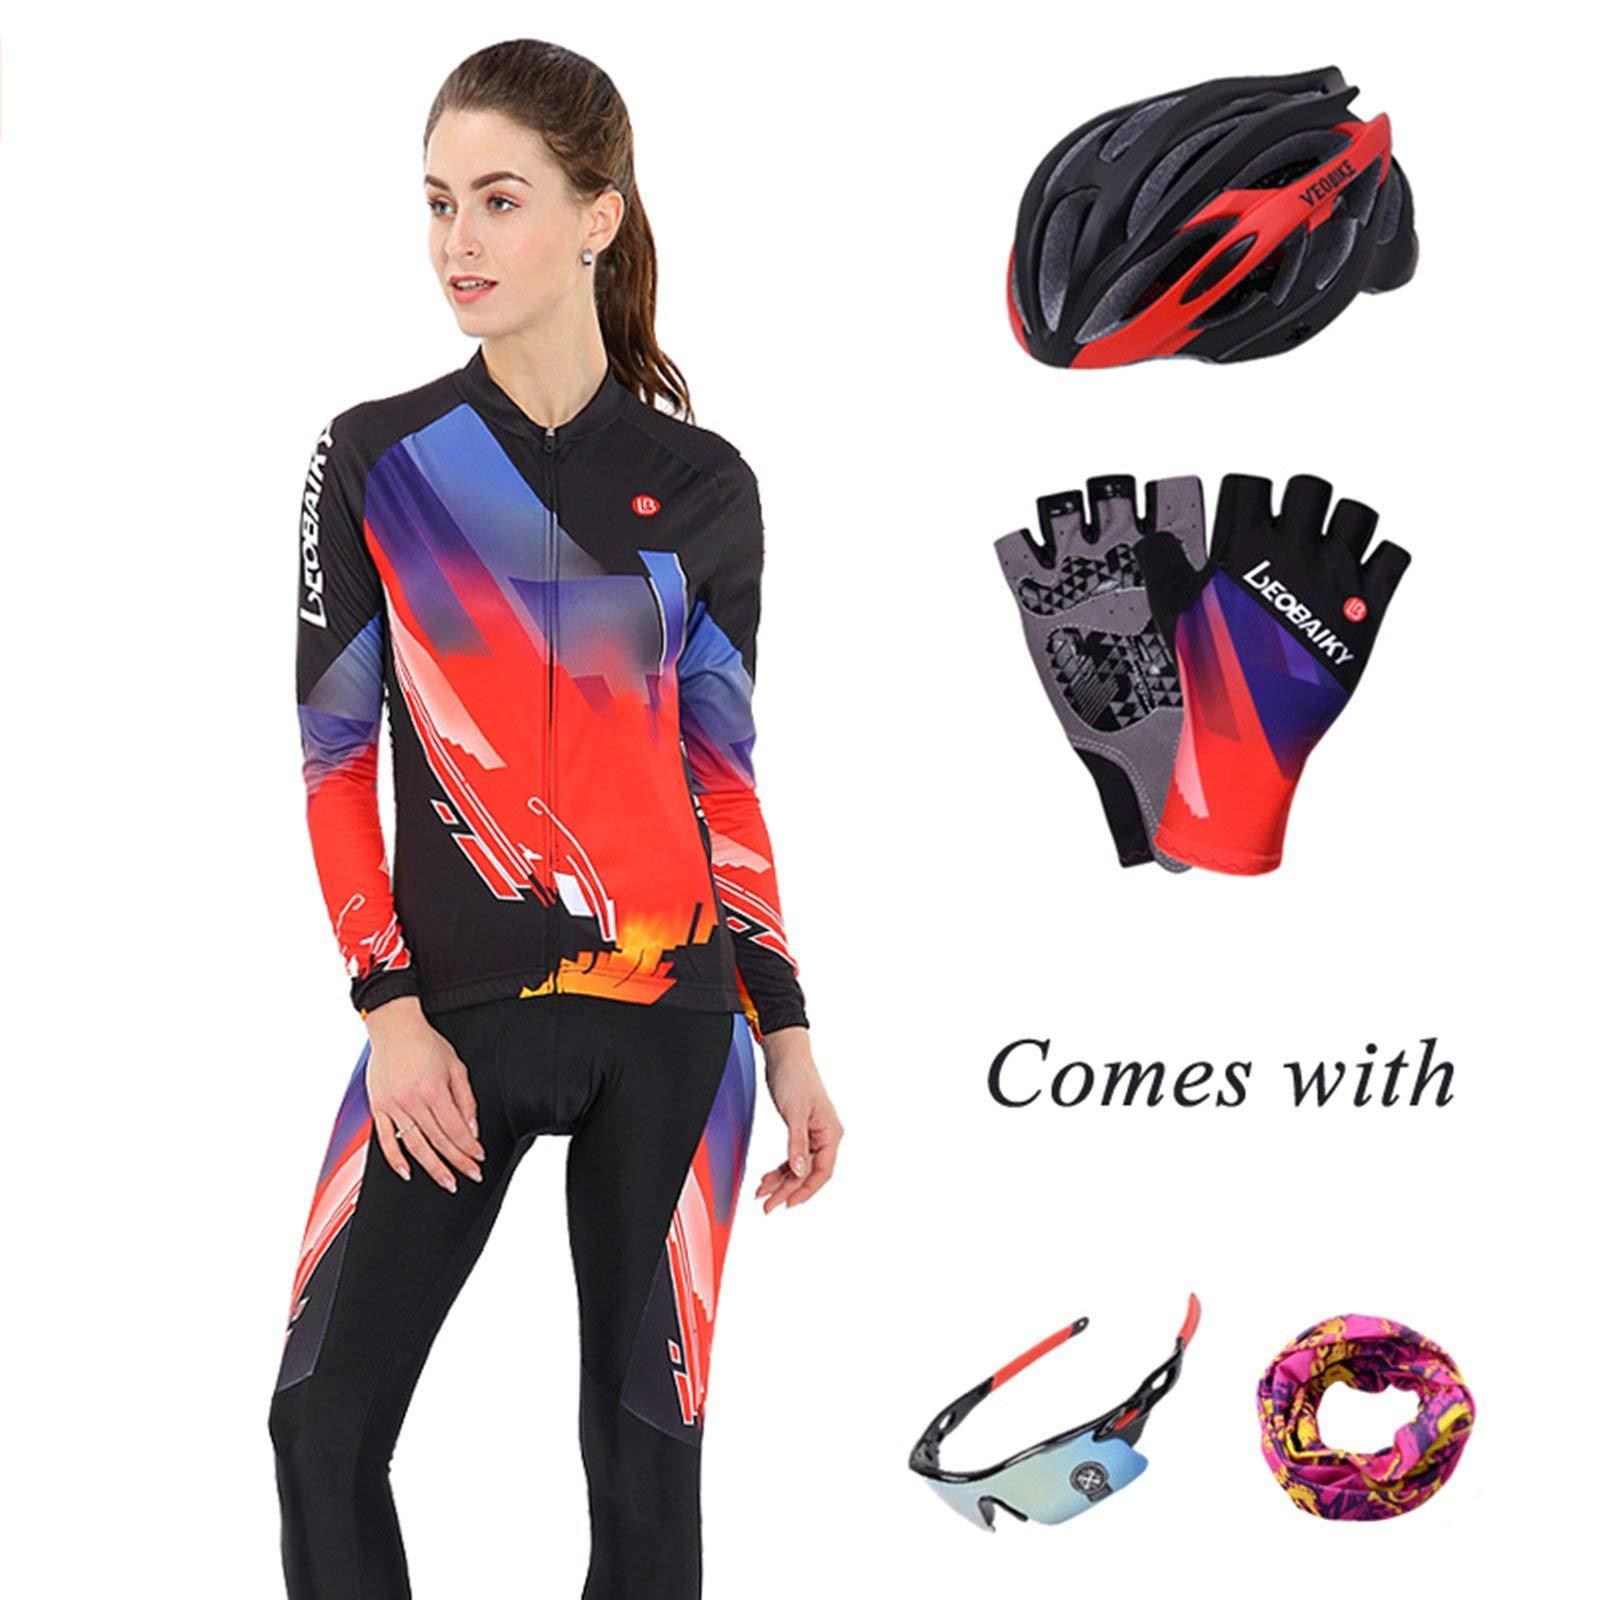 Aooaz Women's Biking Clothing Set Shirt Leggings with Helmet/Gloves/Goggles/Mask Black S